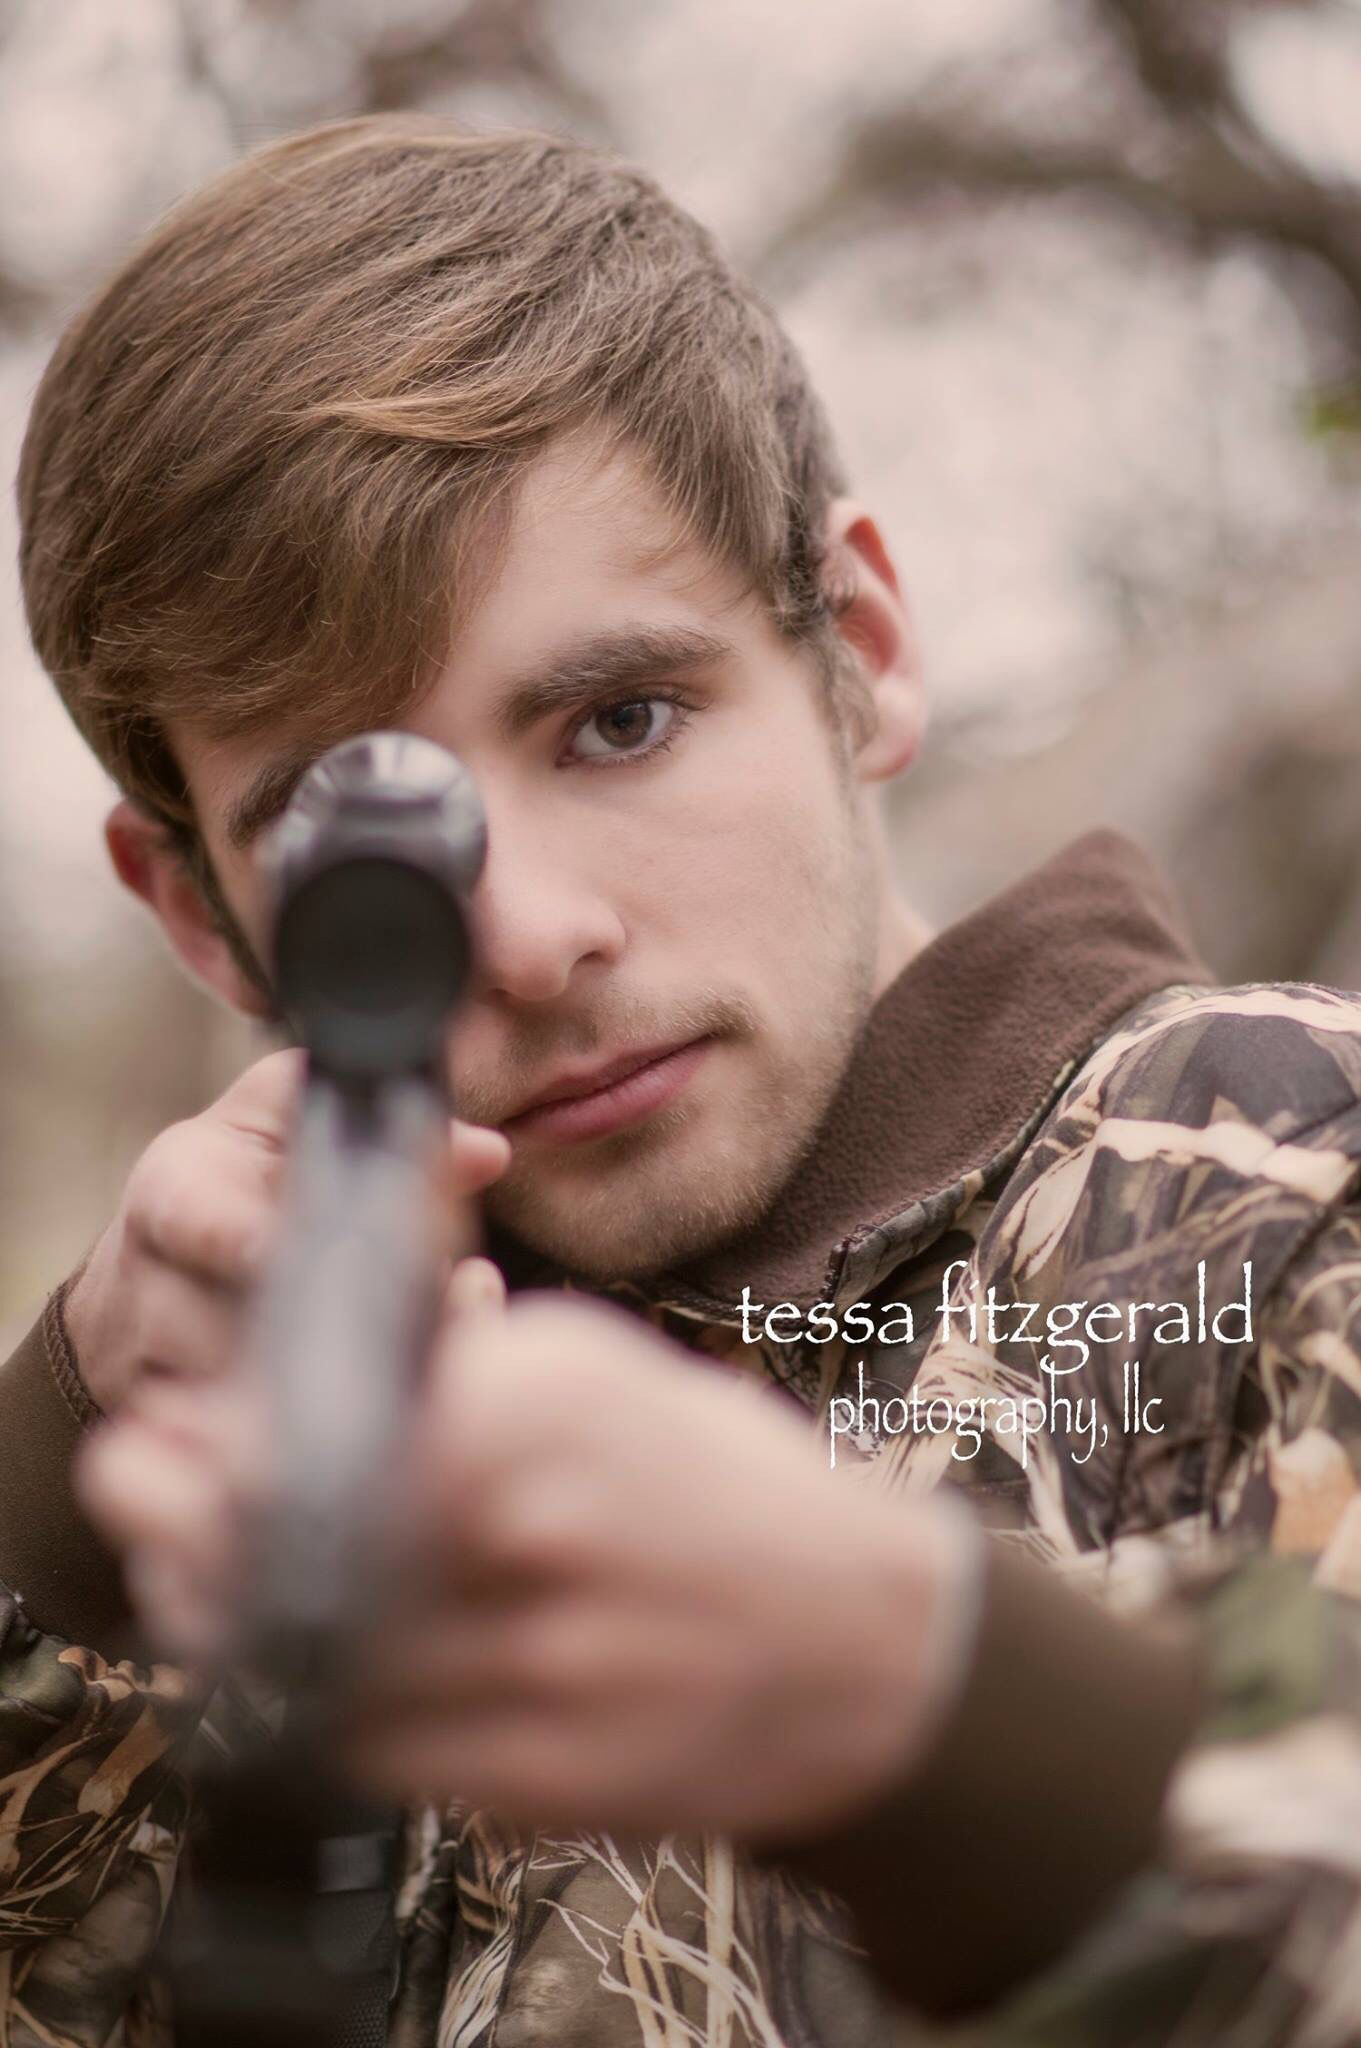 #seniorphoto #graduationpic #boyseniorpic #seniorpic #huntingpic #louisianaphotographer #seniorportrait #tessafitzgeraldphotography